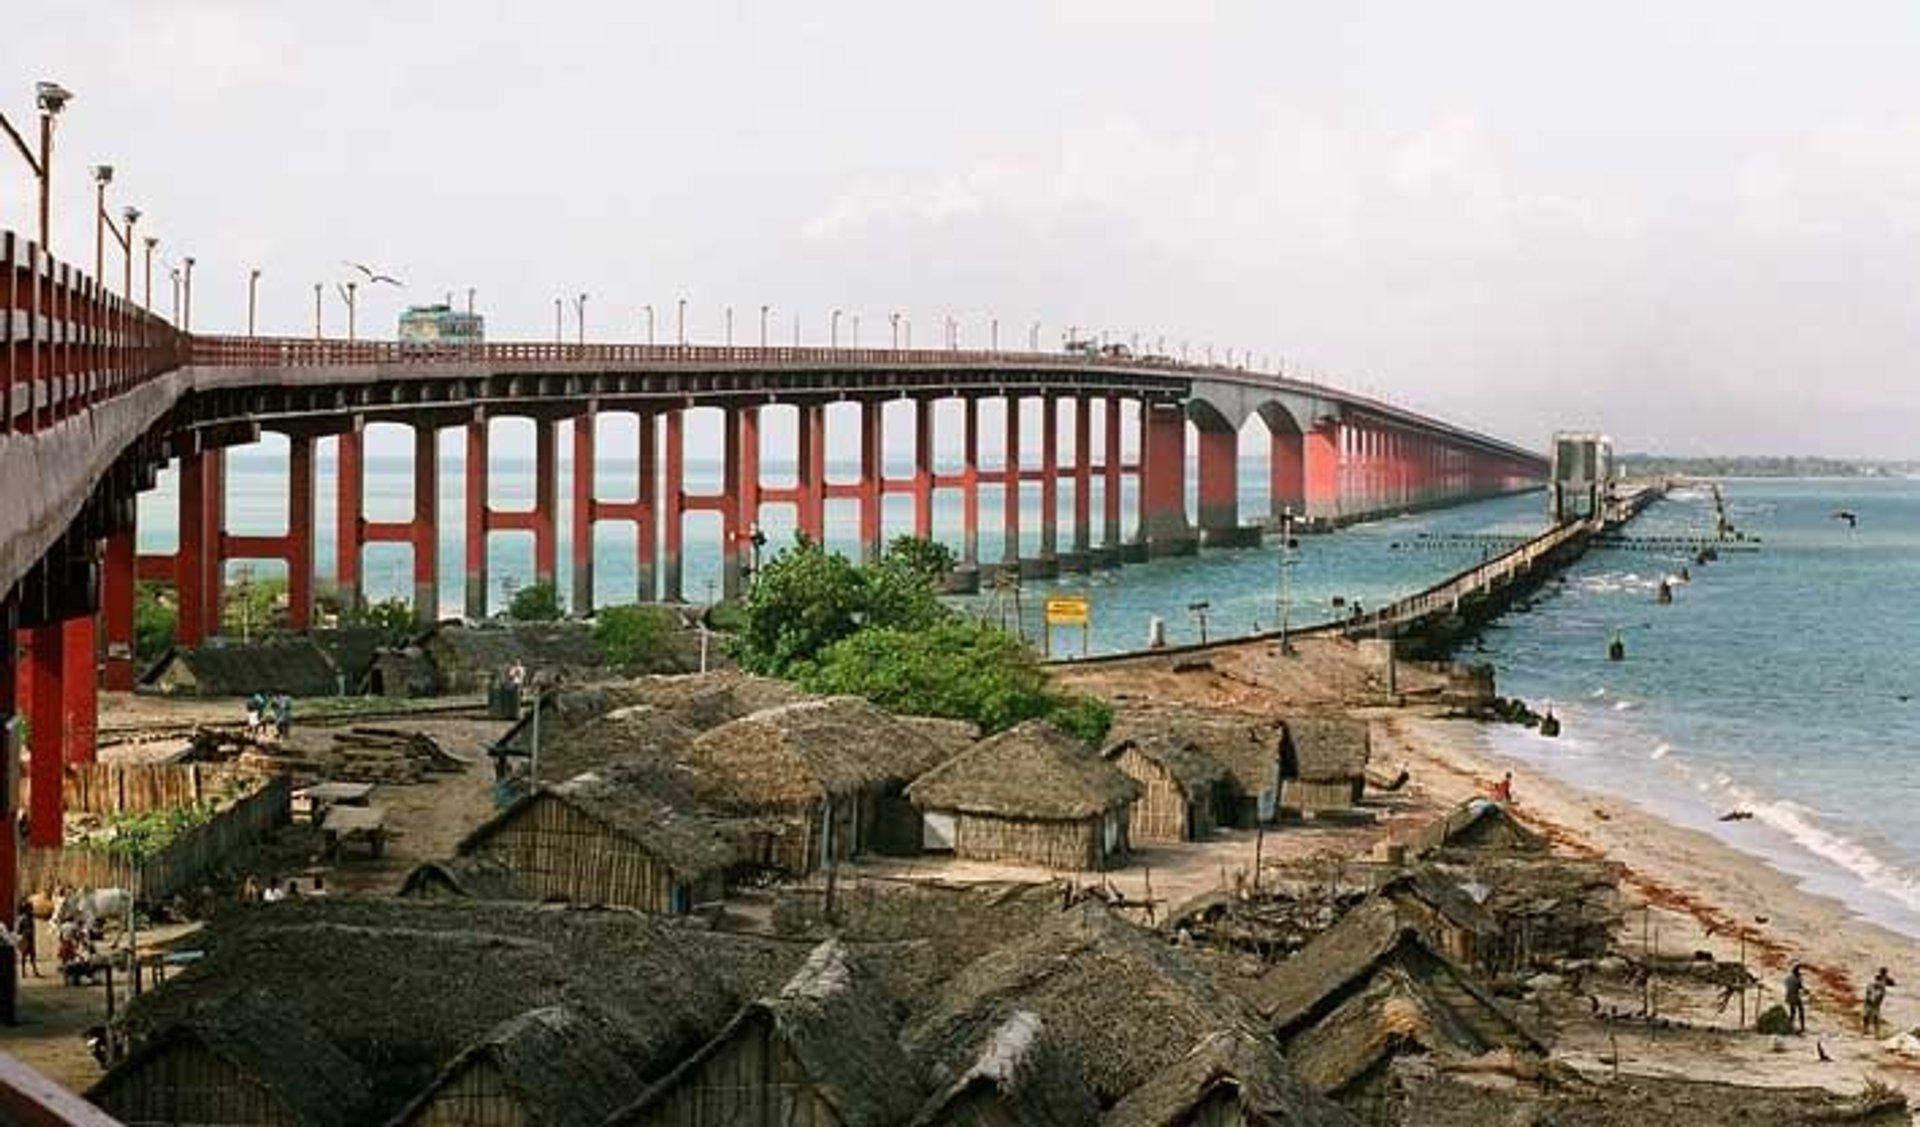 Pamban Road Bridge to the left, and Pamban Railway Bridge to the right 2020